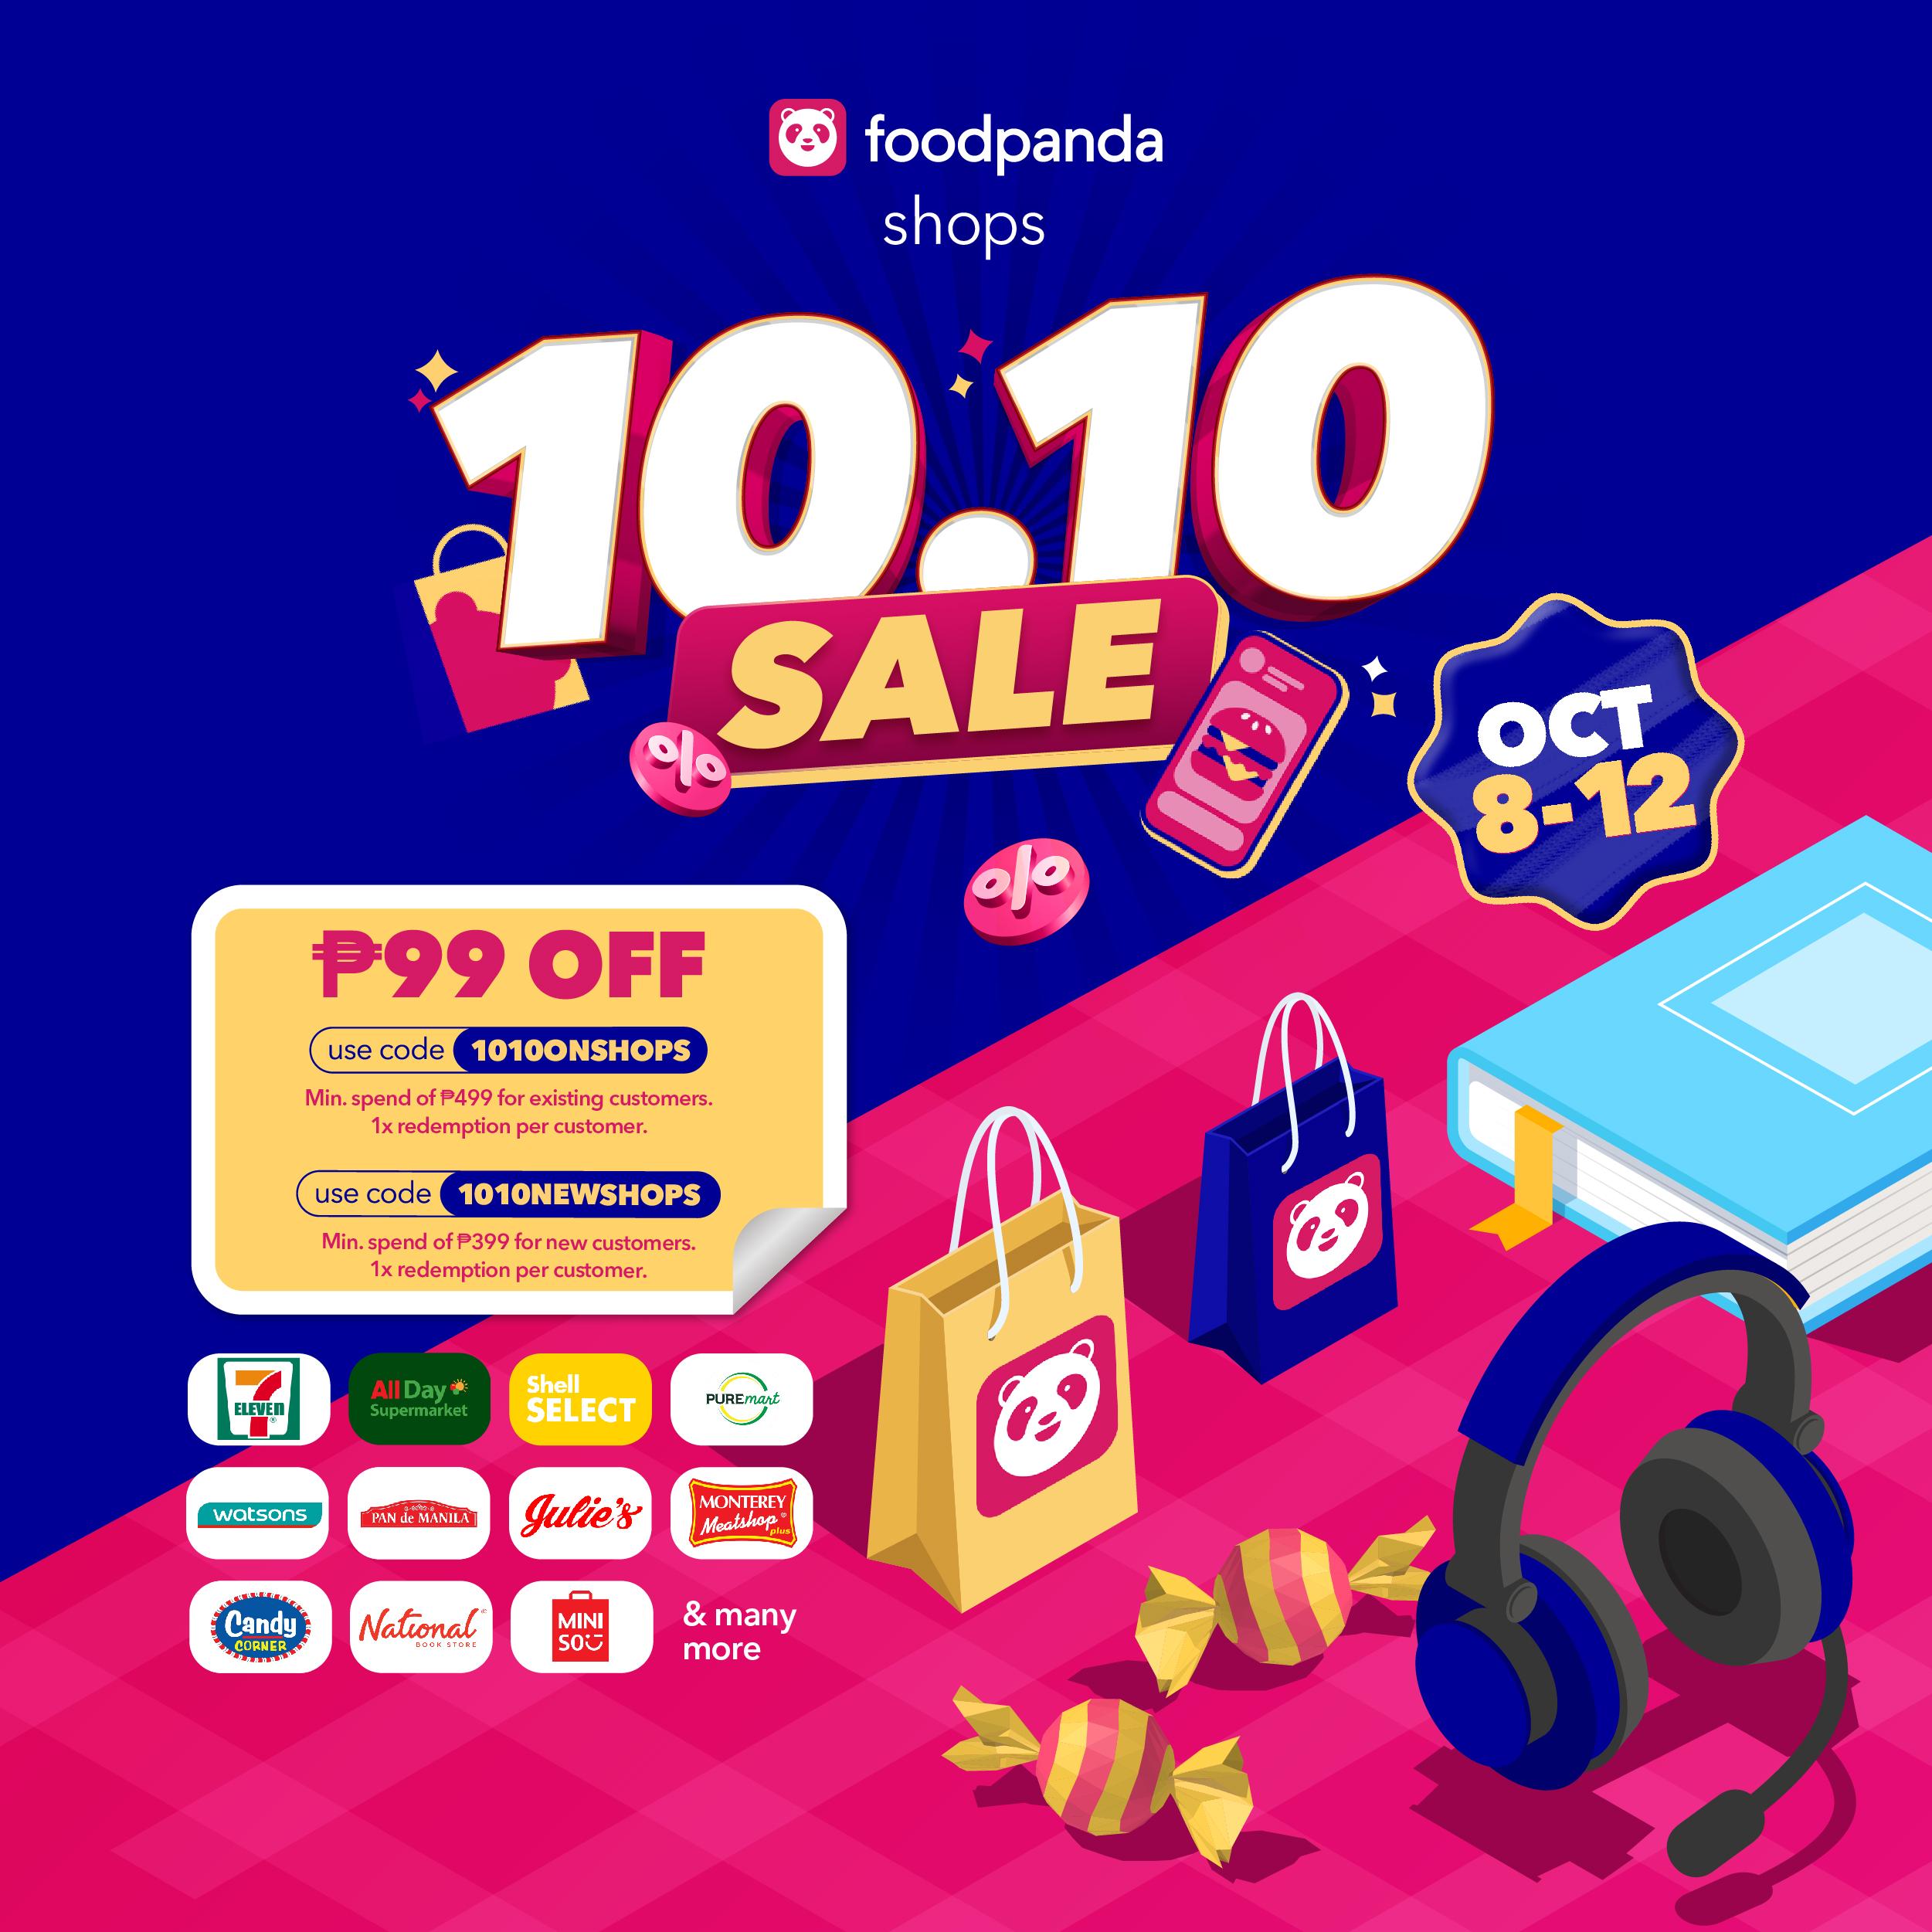 foodpanda 10.10 online shopping